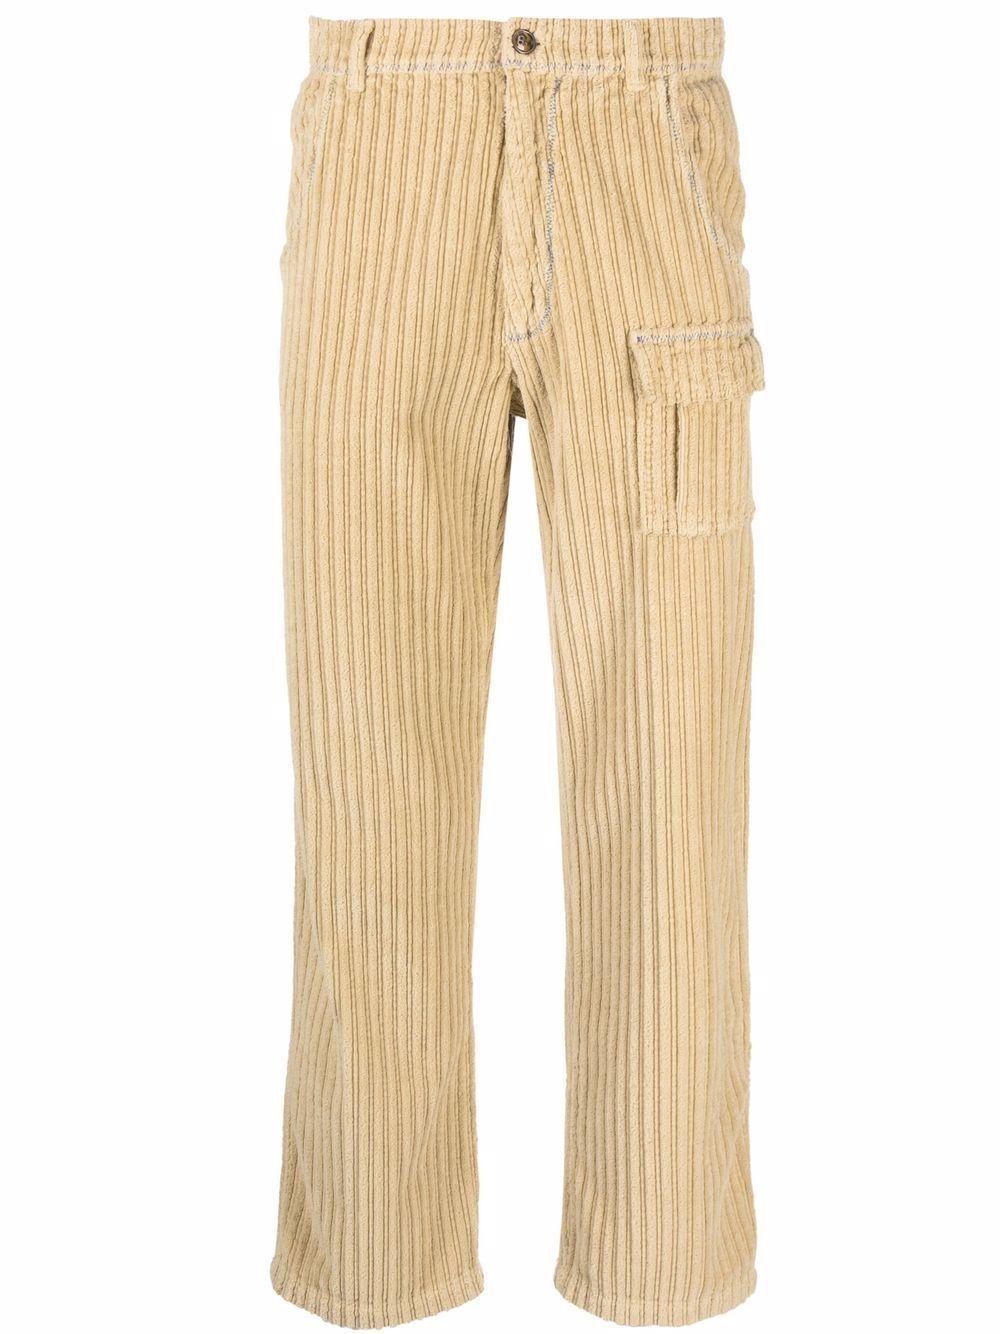 Erl pantaloni beige